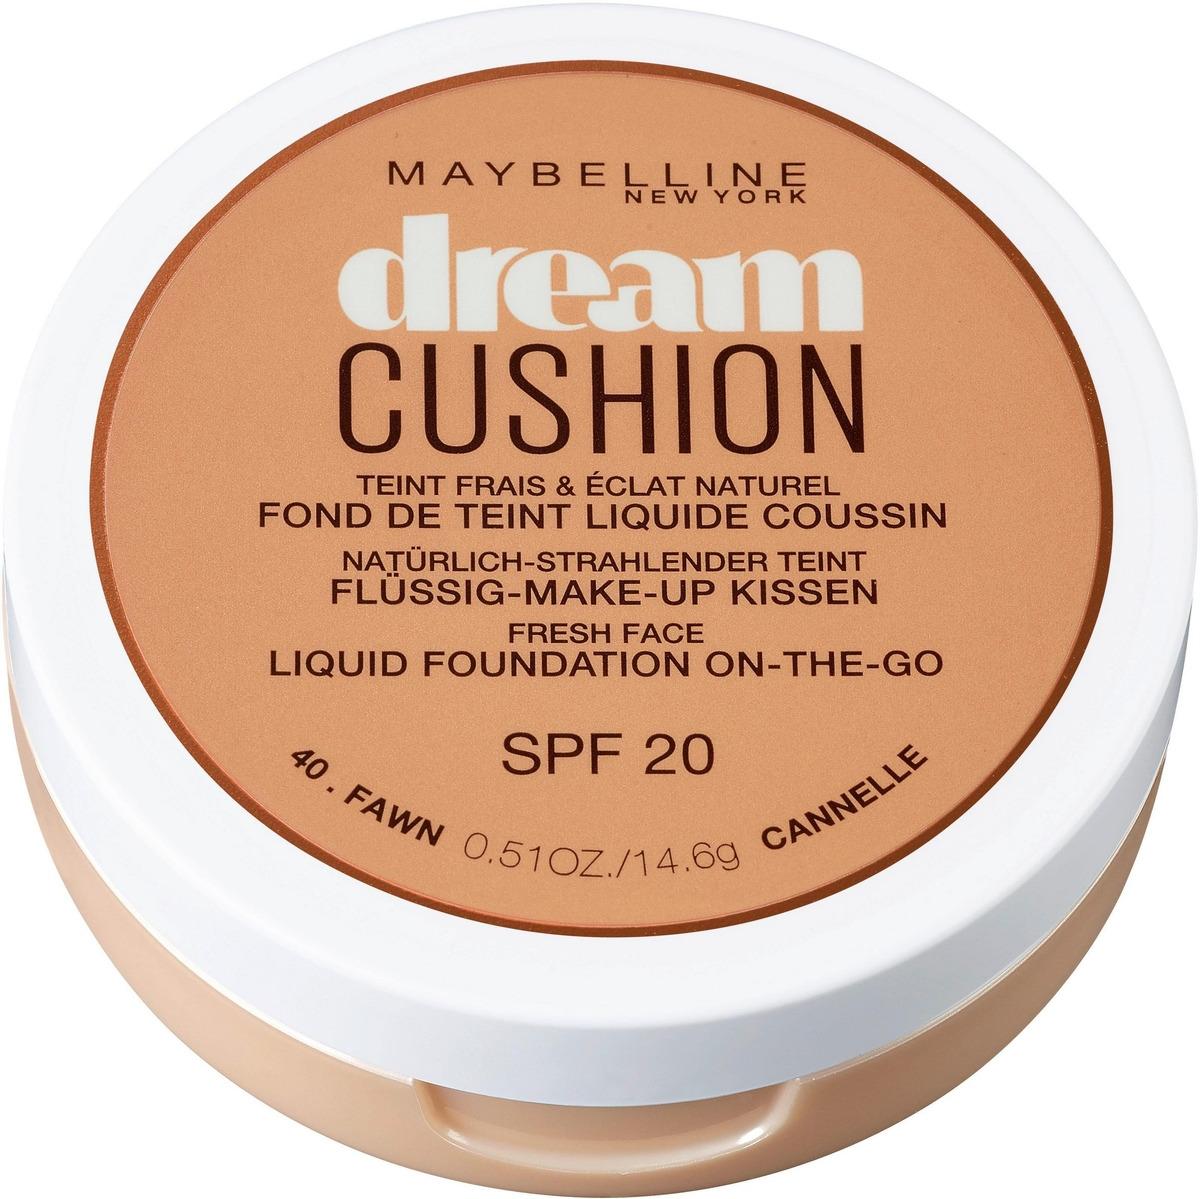 Maybelline New York Тональный крем-кушон для лица Dream Cushion, увлажняющий, оттенок 40 Fawn, SPF 20, 14,6 г